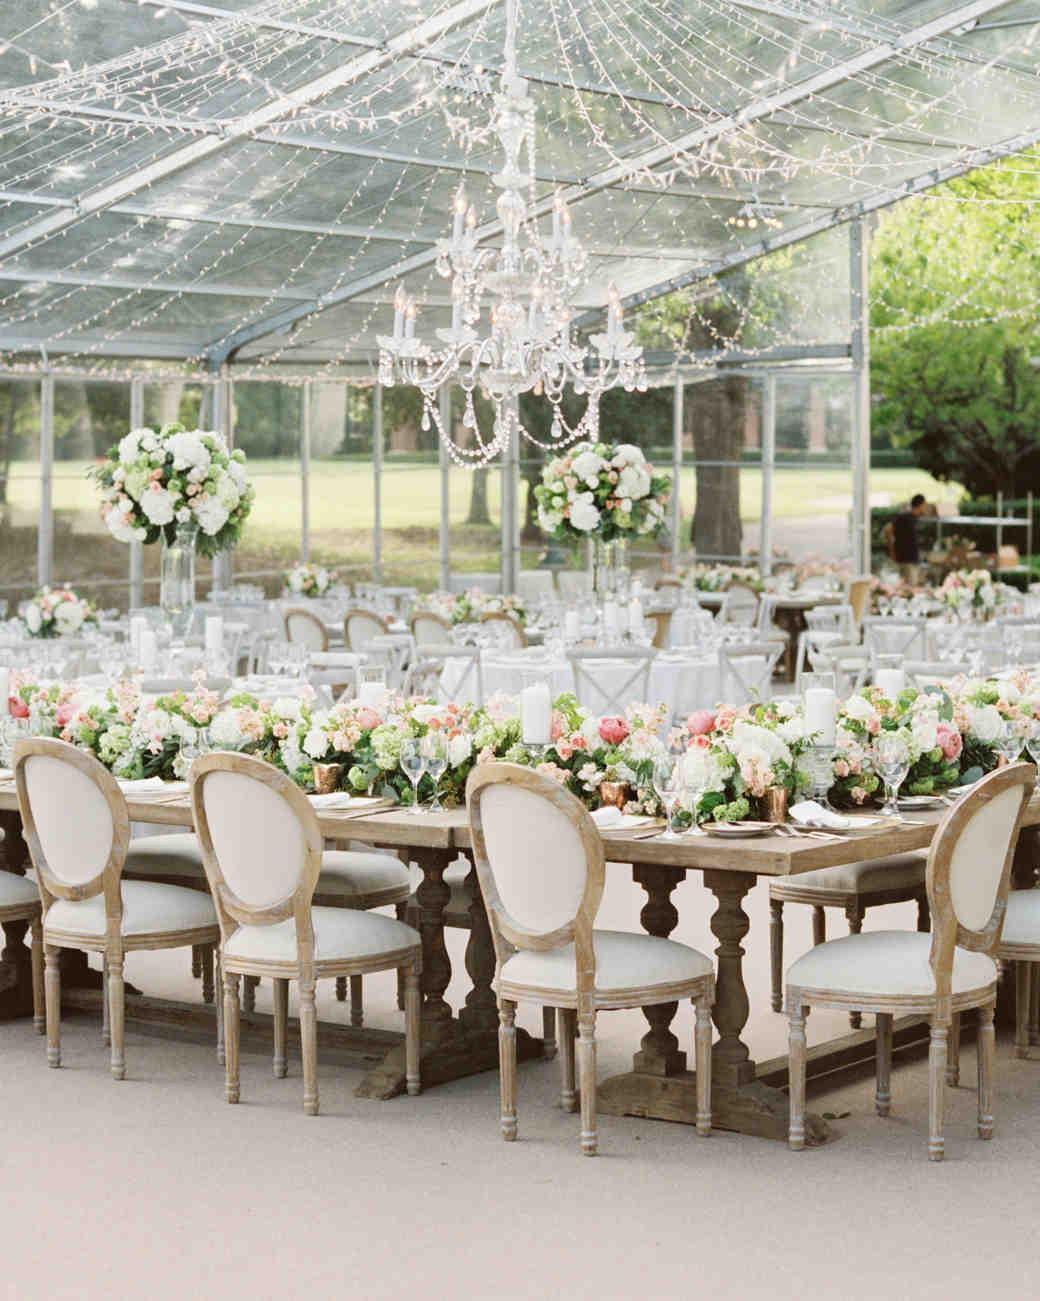 28 Tent Decorating Ideas That Will Upgrade Your Wedding Reception | Martha Stewart Weddings & 28 Tent Decorating Ideas That Will Upgrade Your Wedding Reception ...